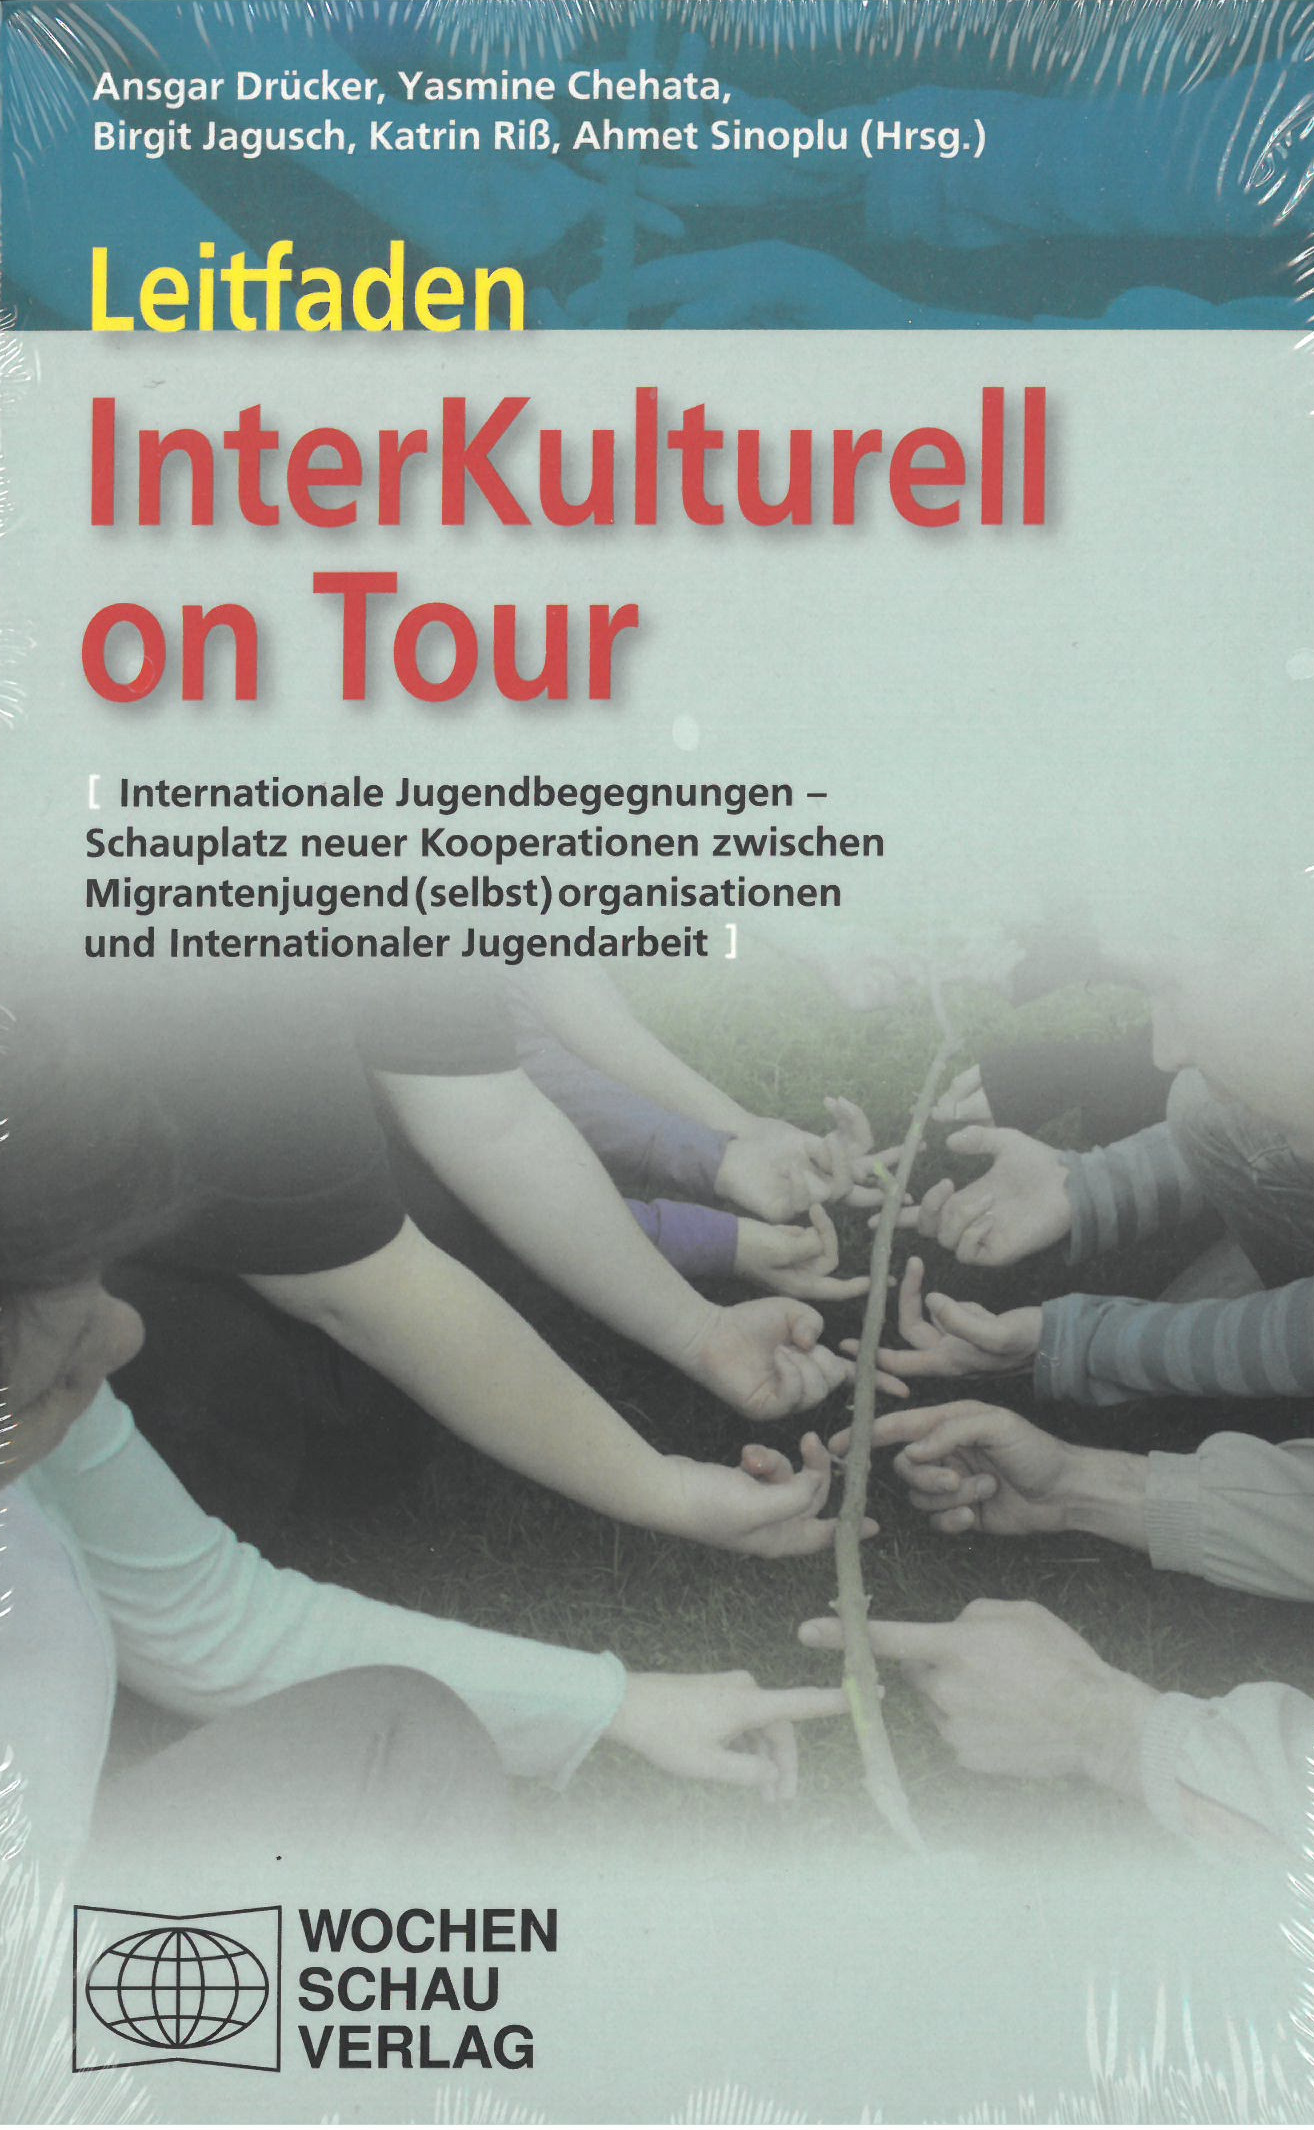 Titelseite Buch Leitfaden InterKulturell on Tour